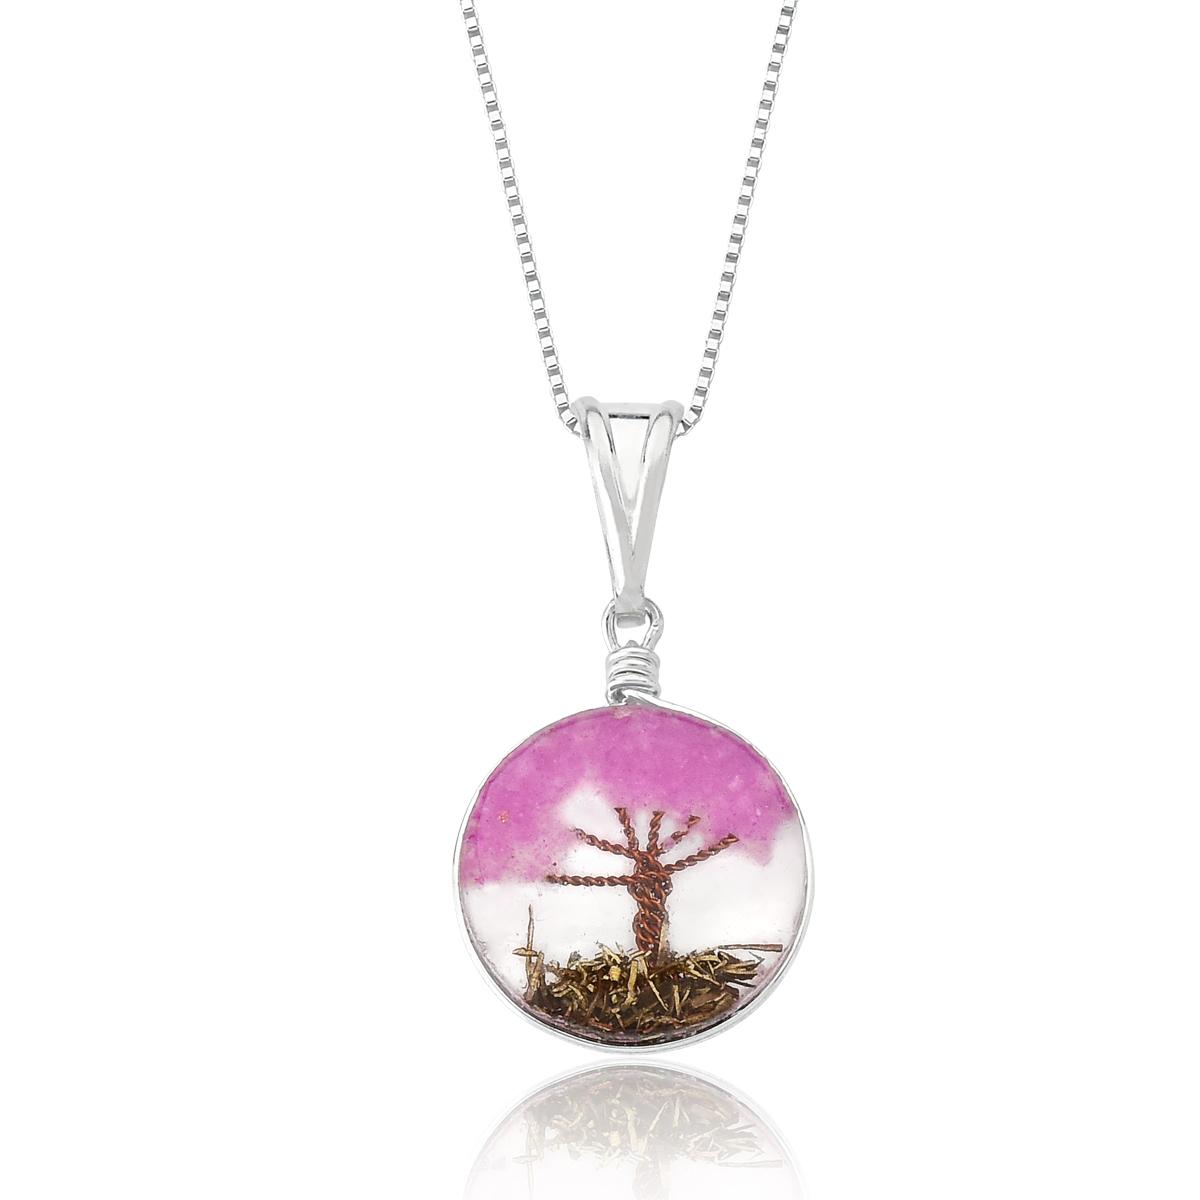 Colar Orgonite Árvore da Vida Rosa Escuro 20 MM - Florescer